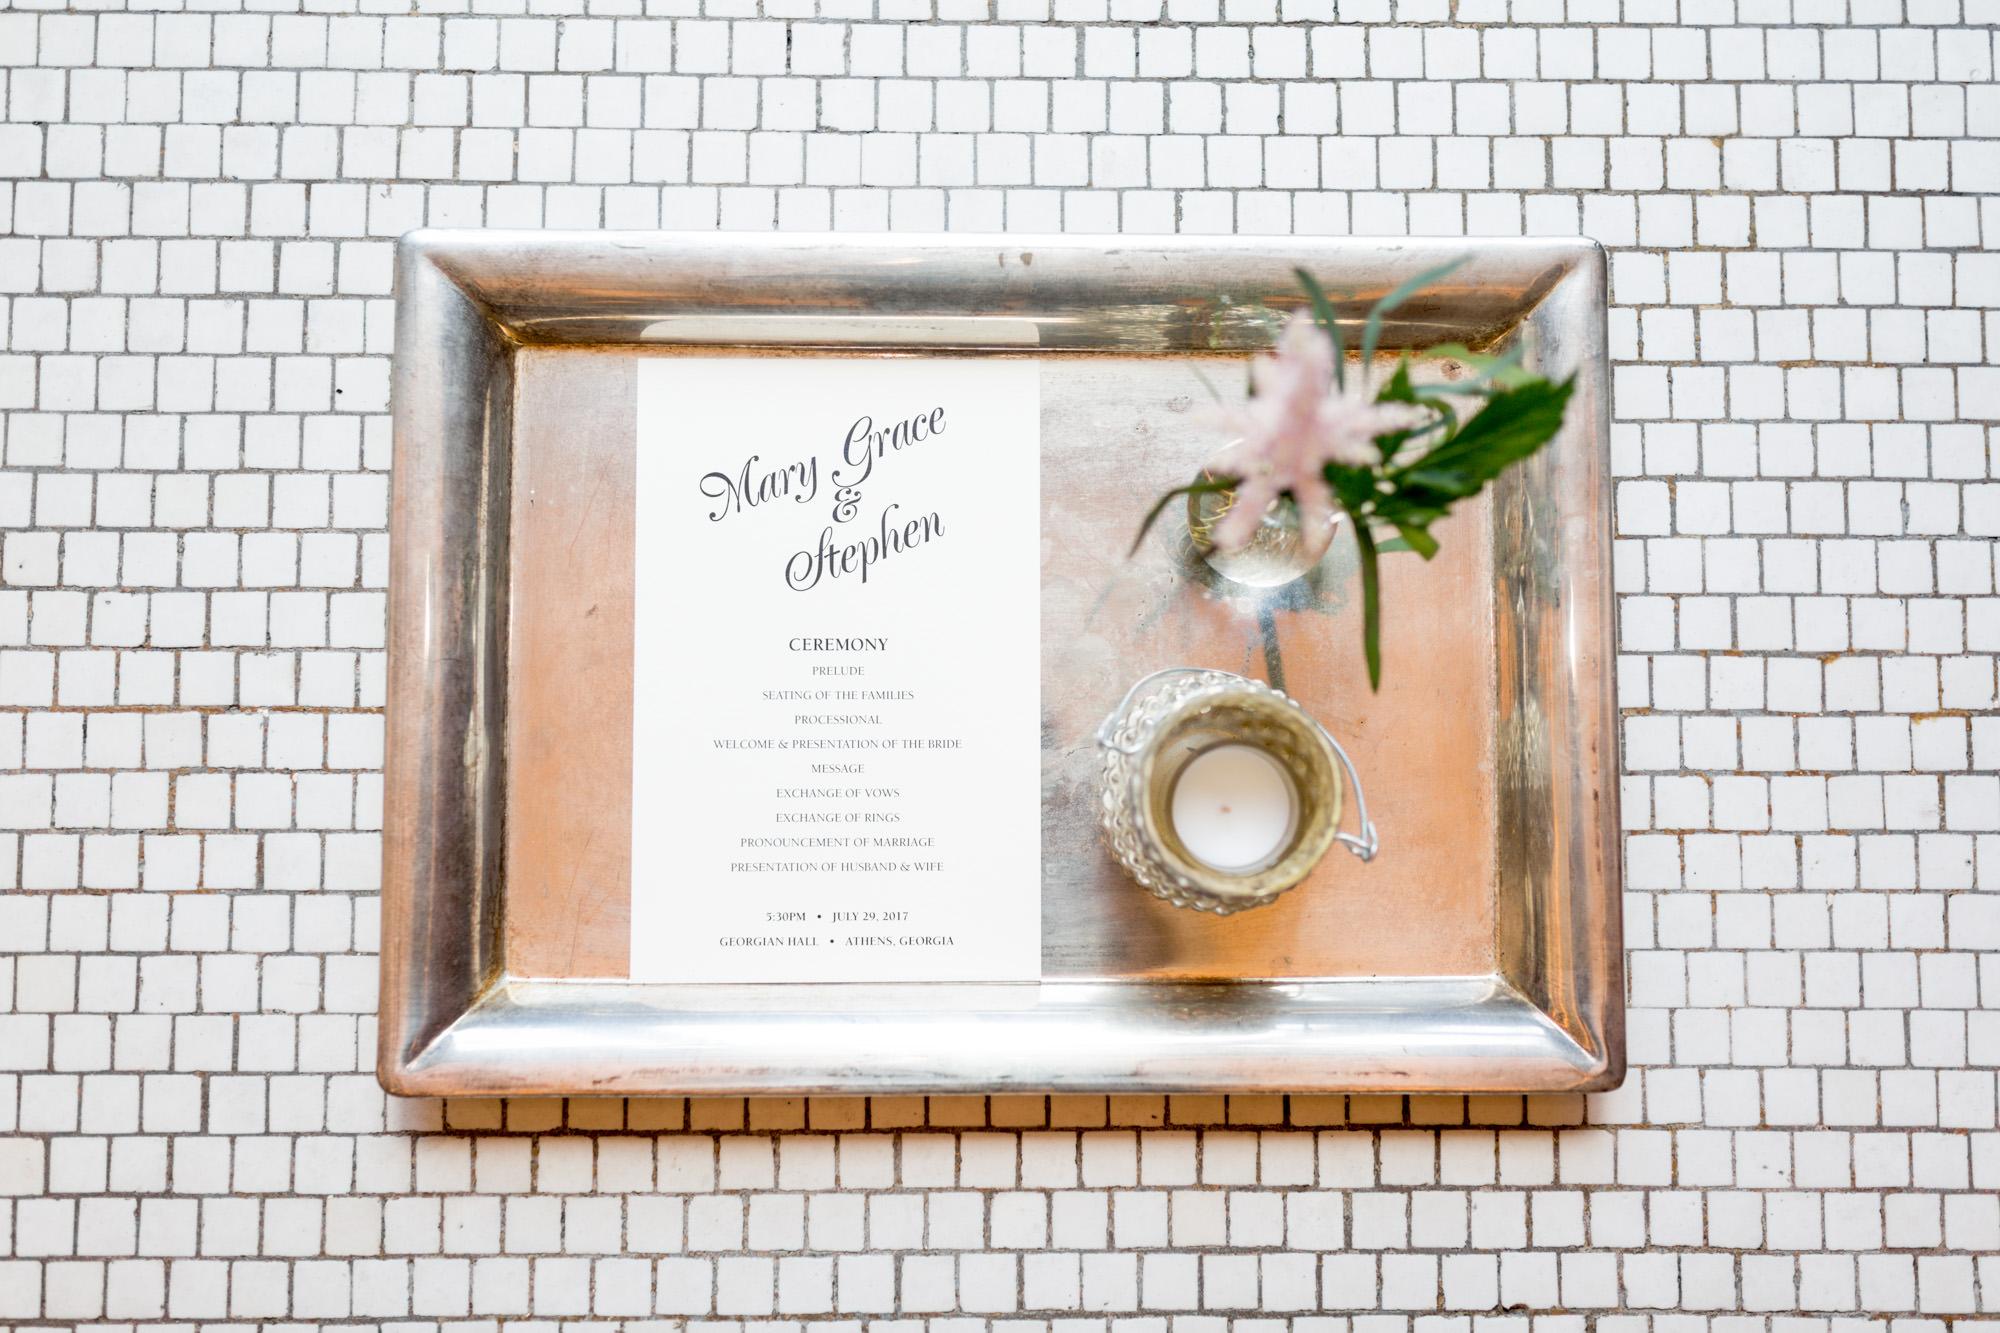 Athens-wedding-ceremony-details.jpg